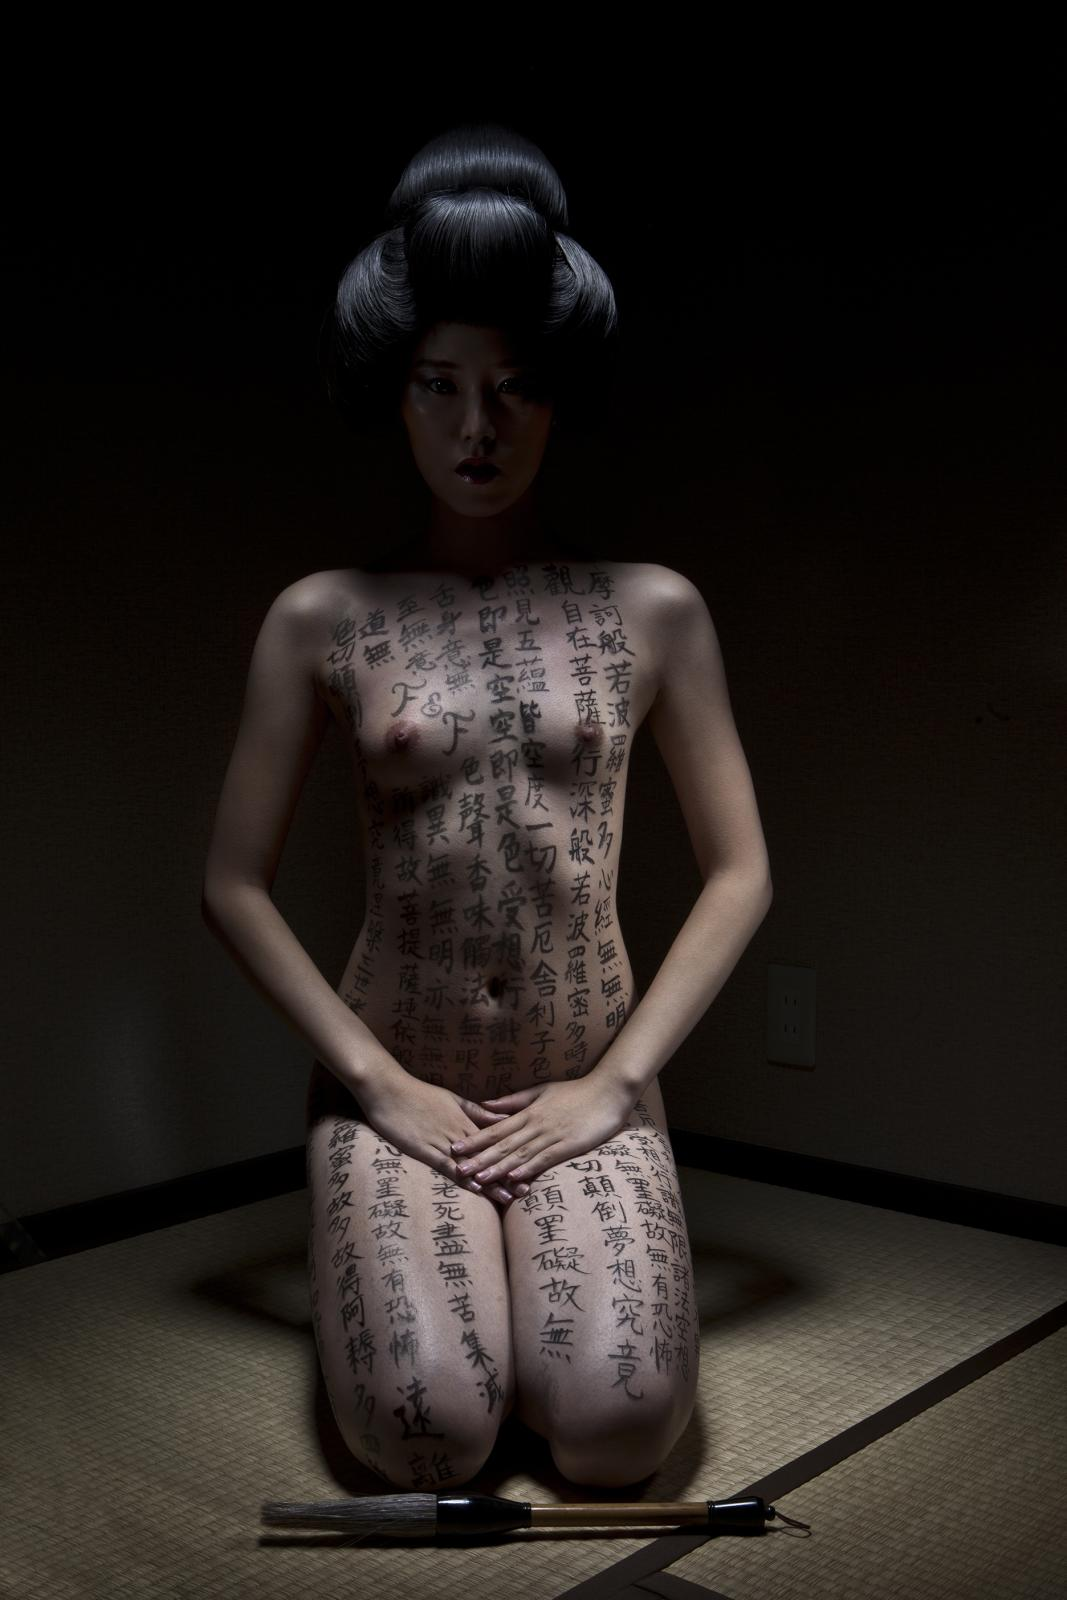 Formento & Formento, Quorra XXV, Hanazono, Japan, 2013